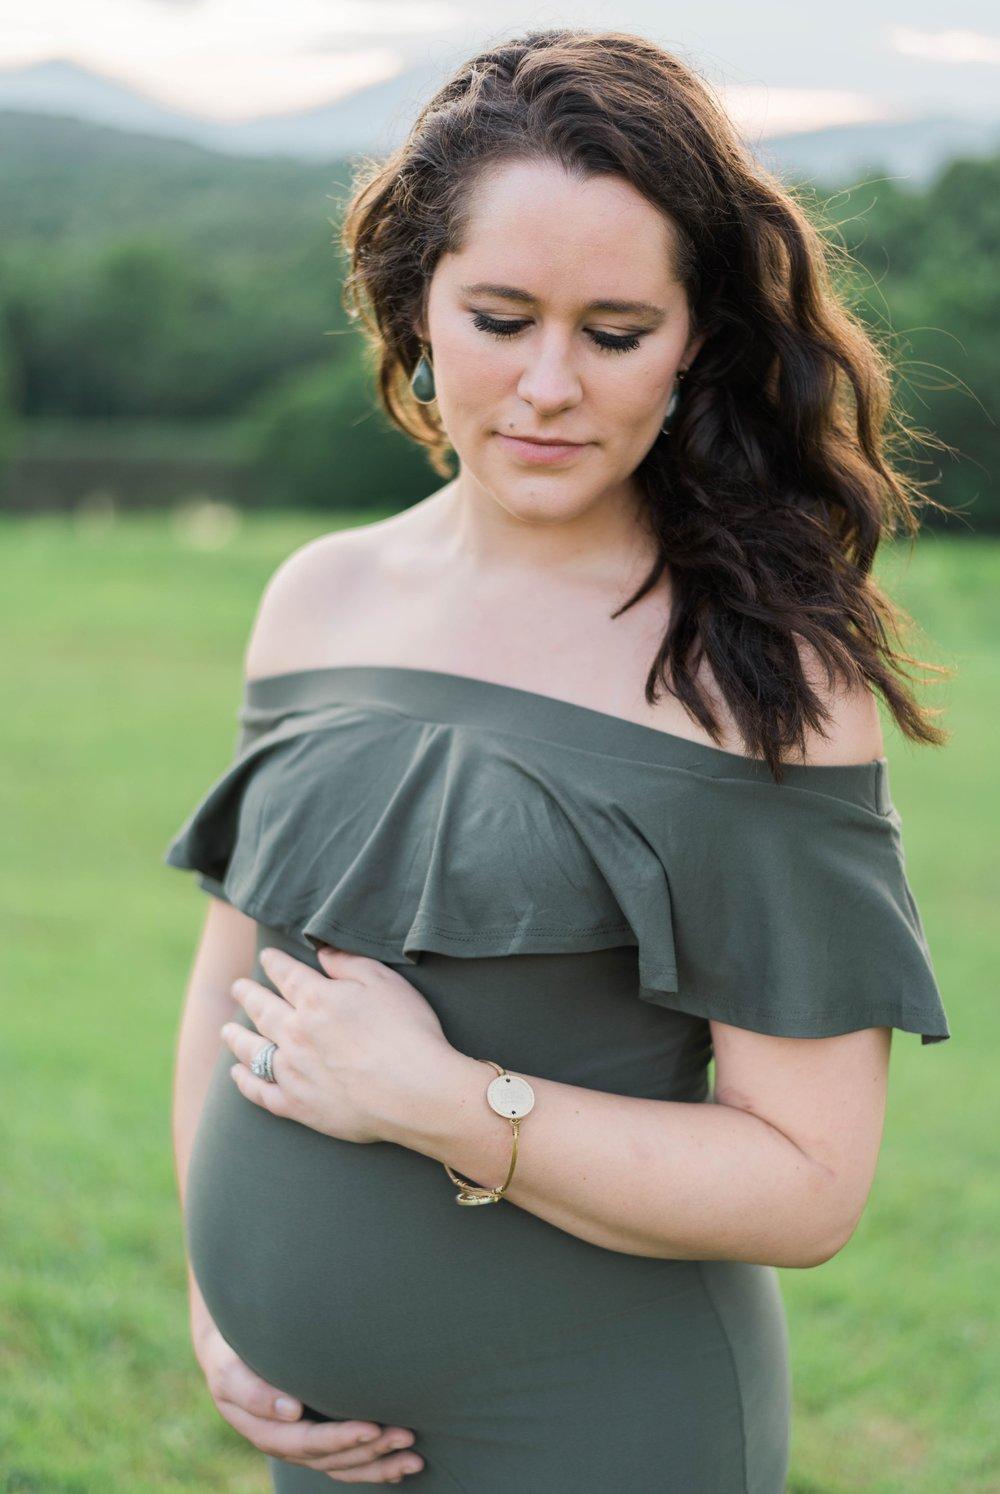 GlassHillVenue_ForestVA_LynchburgVA_CentralVirginiaphotographer_LynchburgPhotographer_MaternityPhotographer 45.jpg